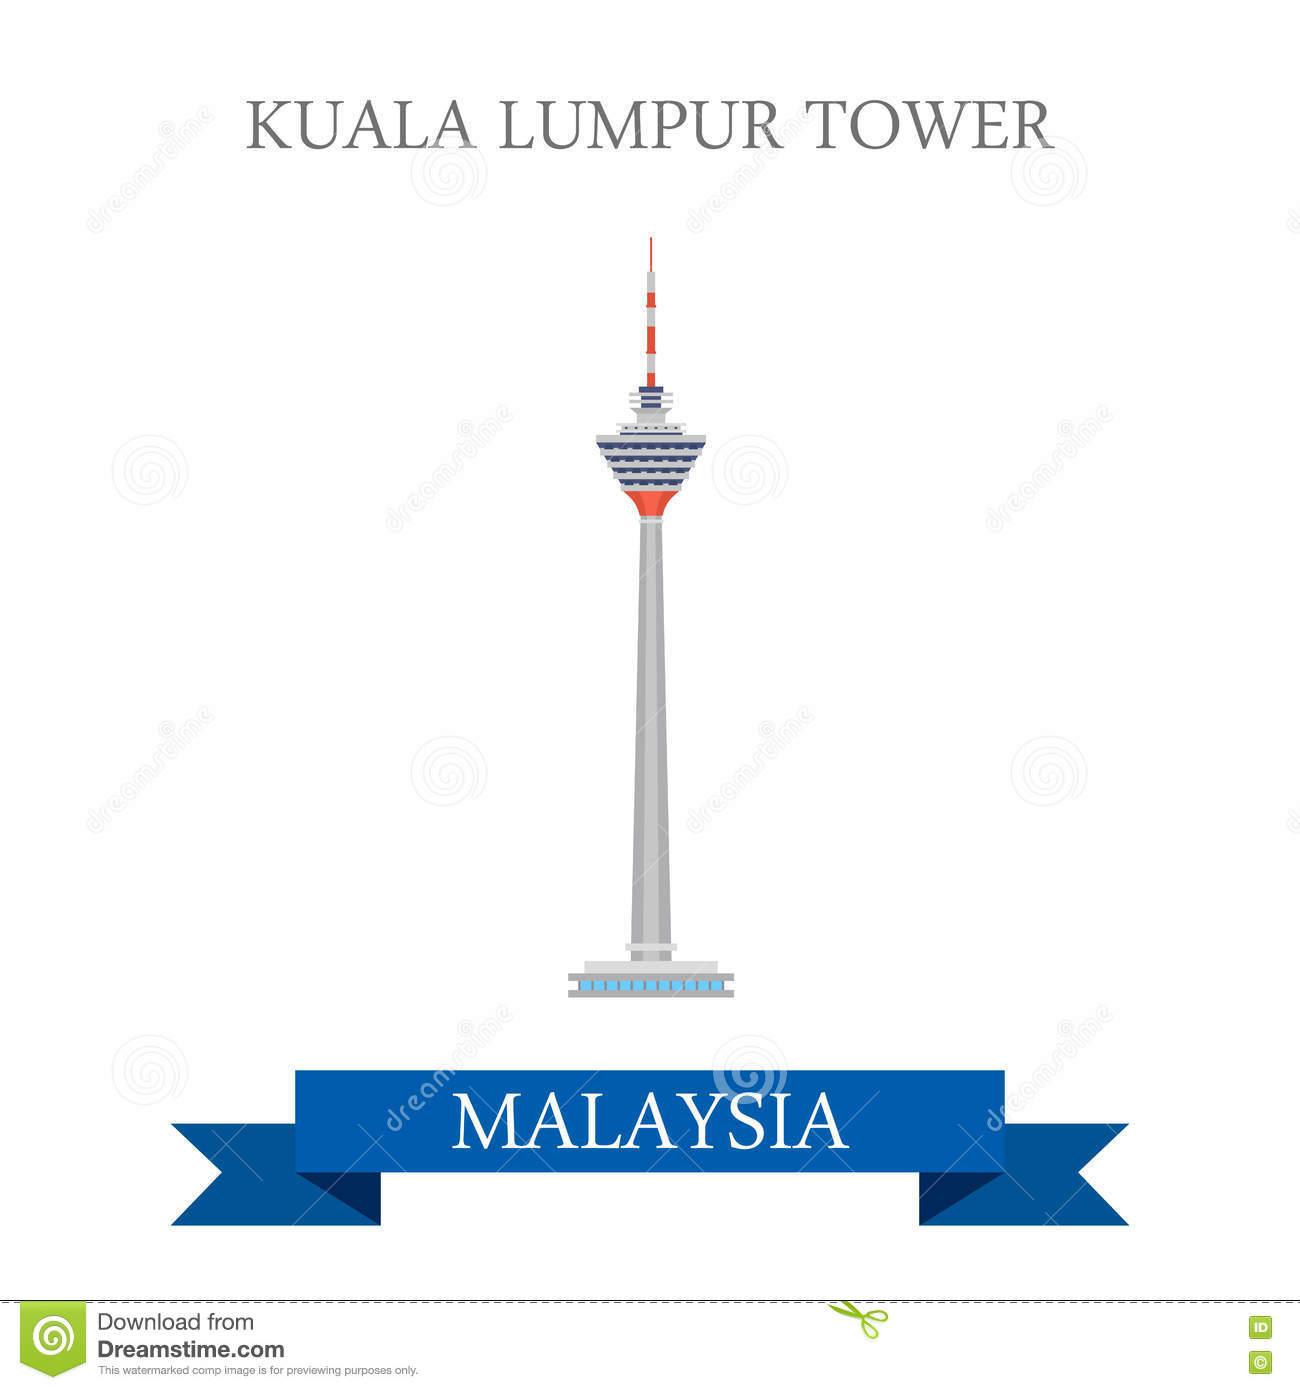 Kuala Lumpur Tower Malaysia Attraction Travel Landmark Stock.